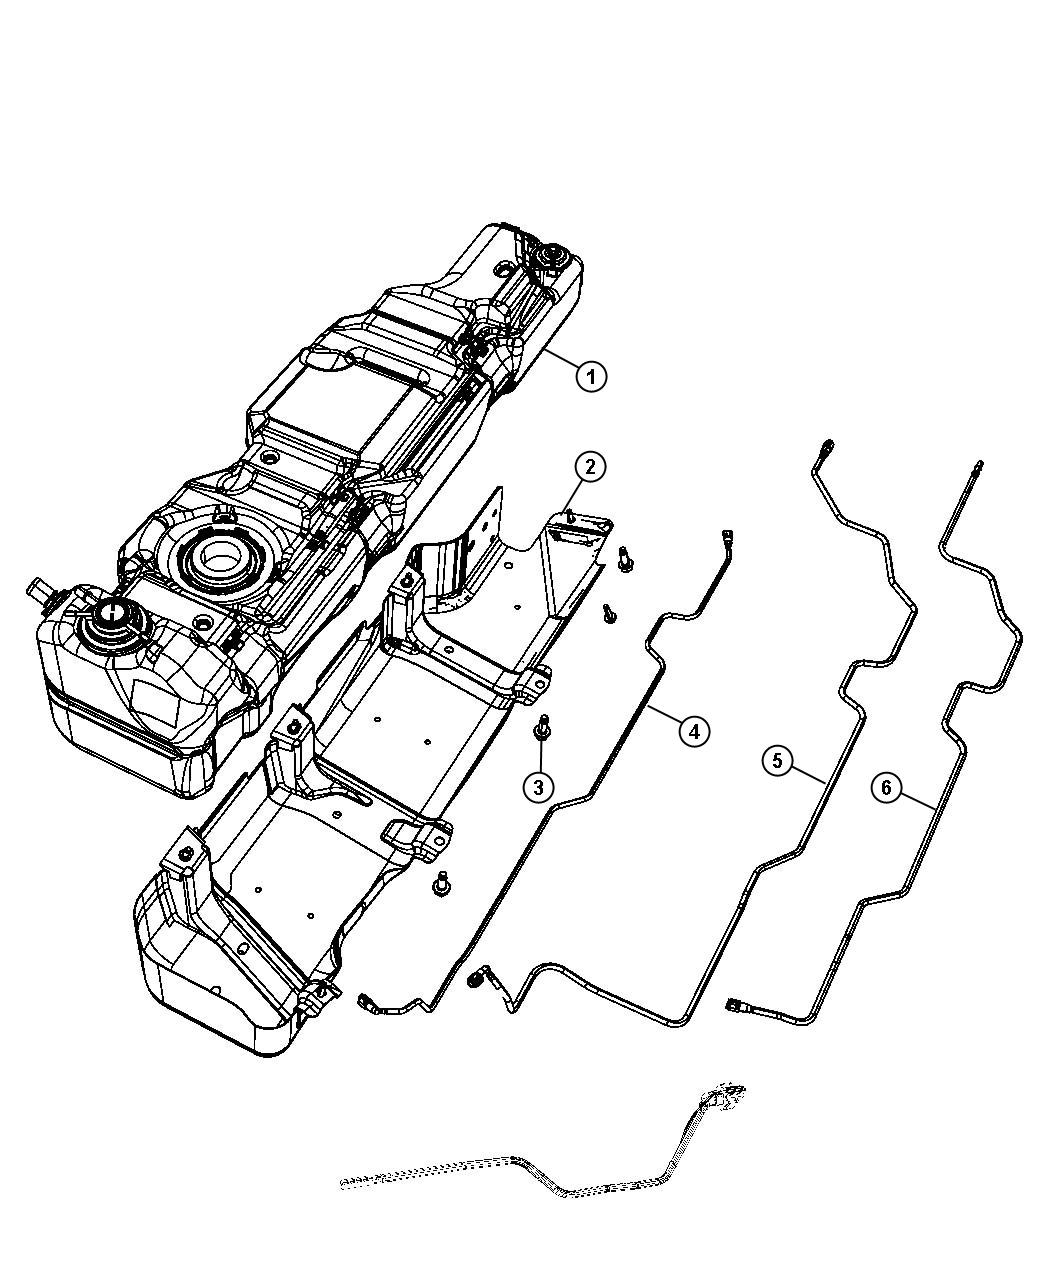 Jeep Wrangler Tank Fuel 22 5 Gallon Fuel Tank 23